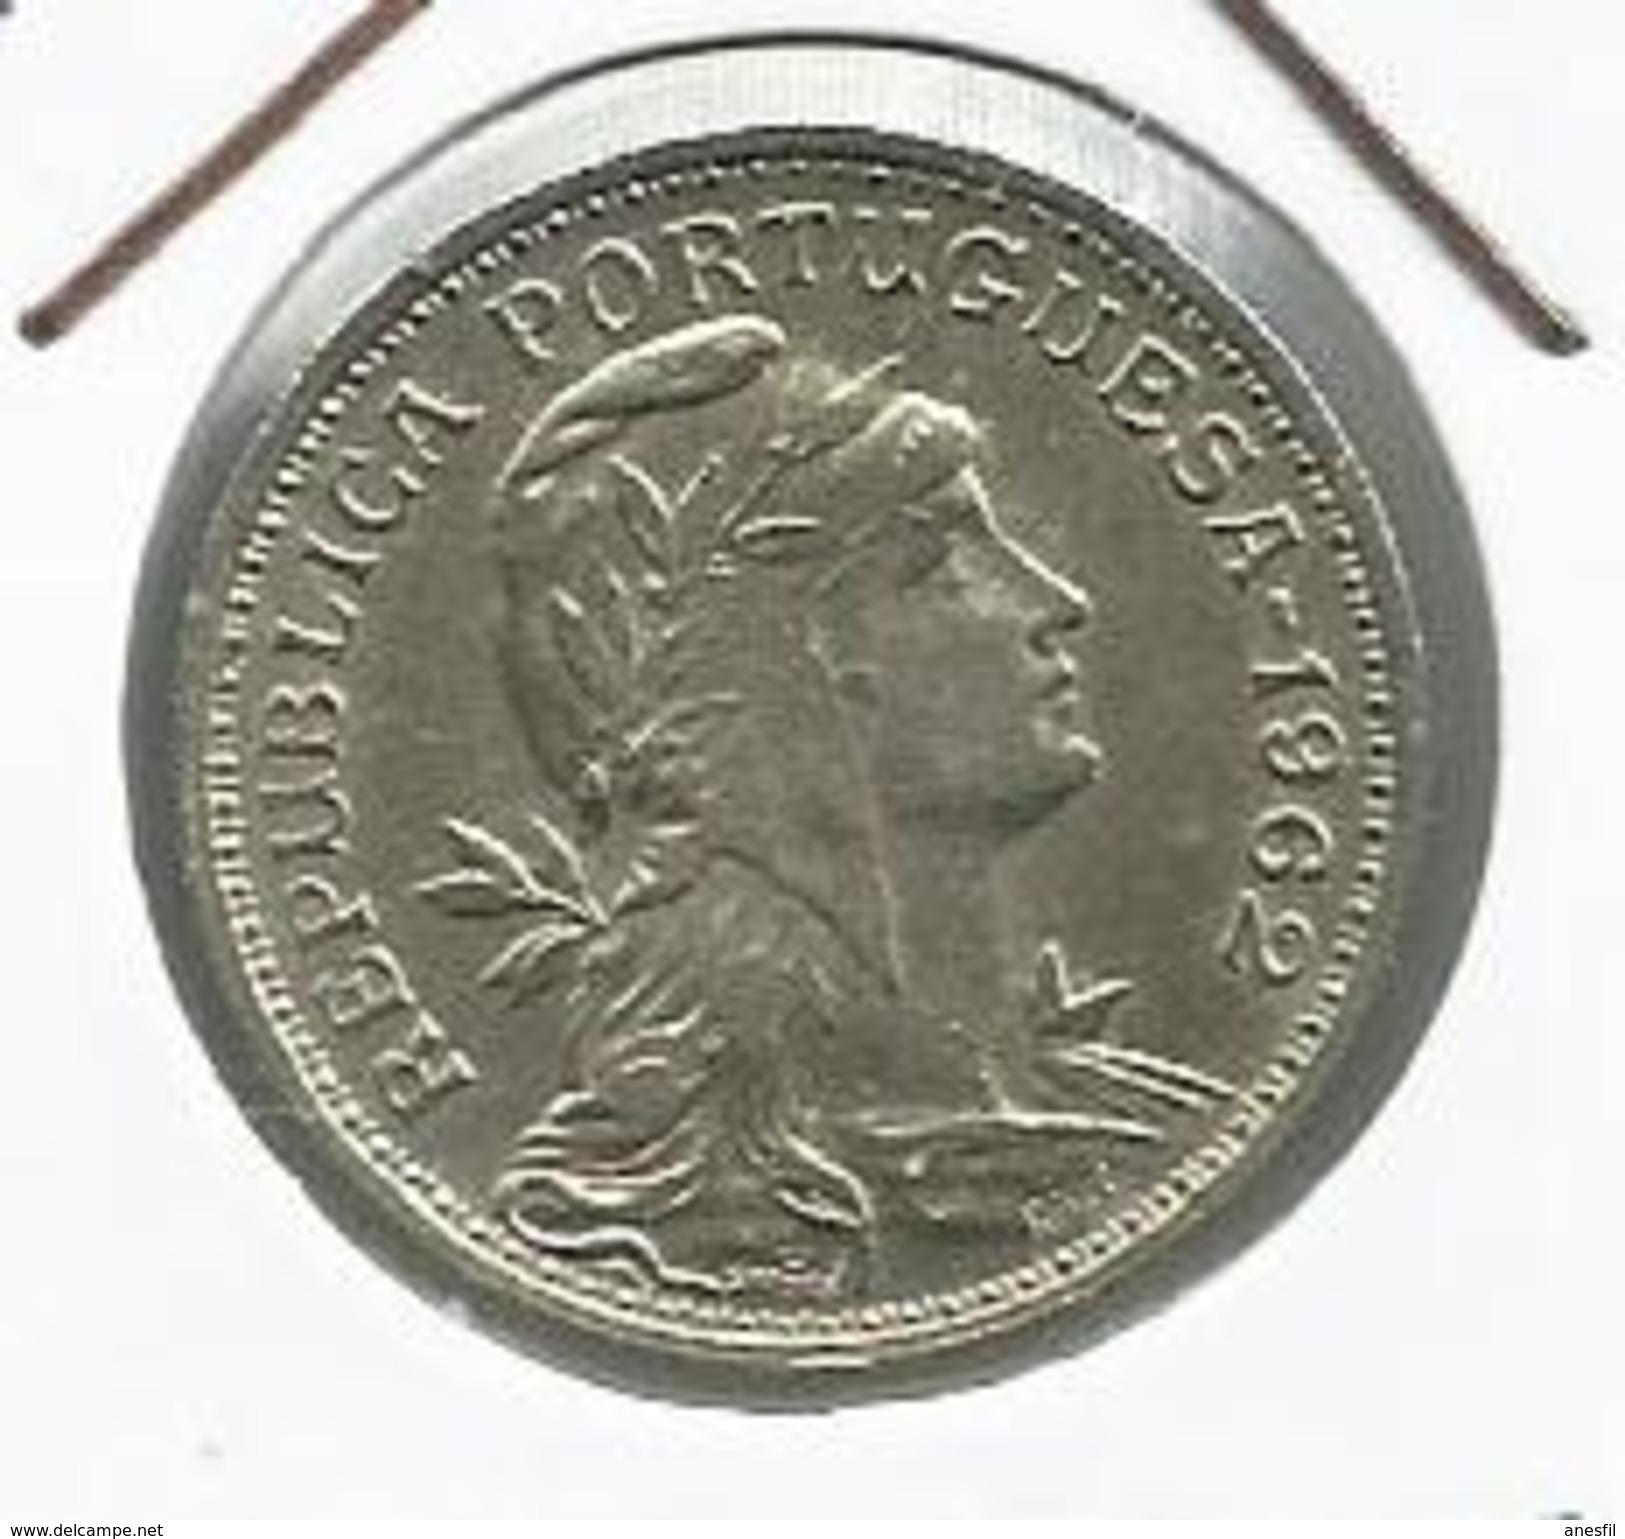 Portugal_1962_50 Centavos. - Portugal